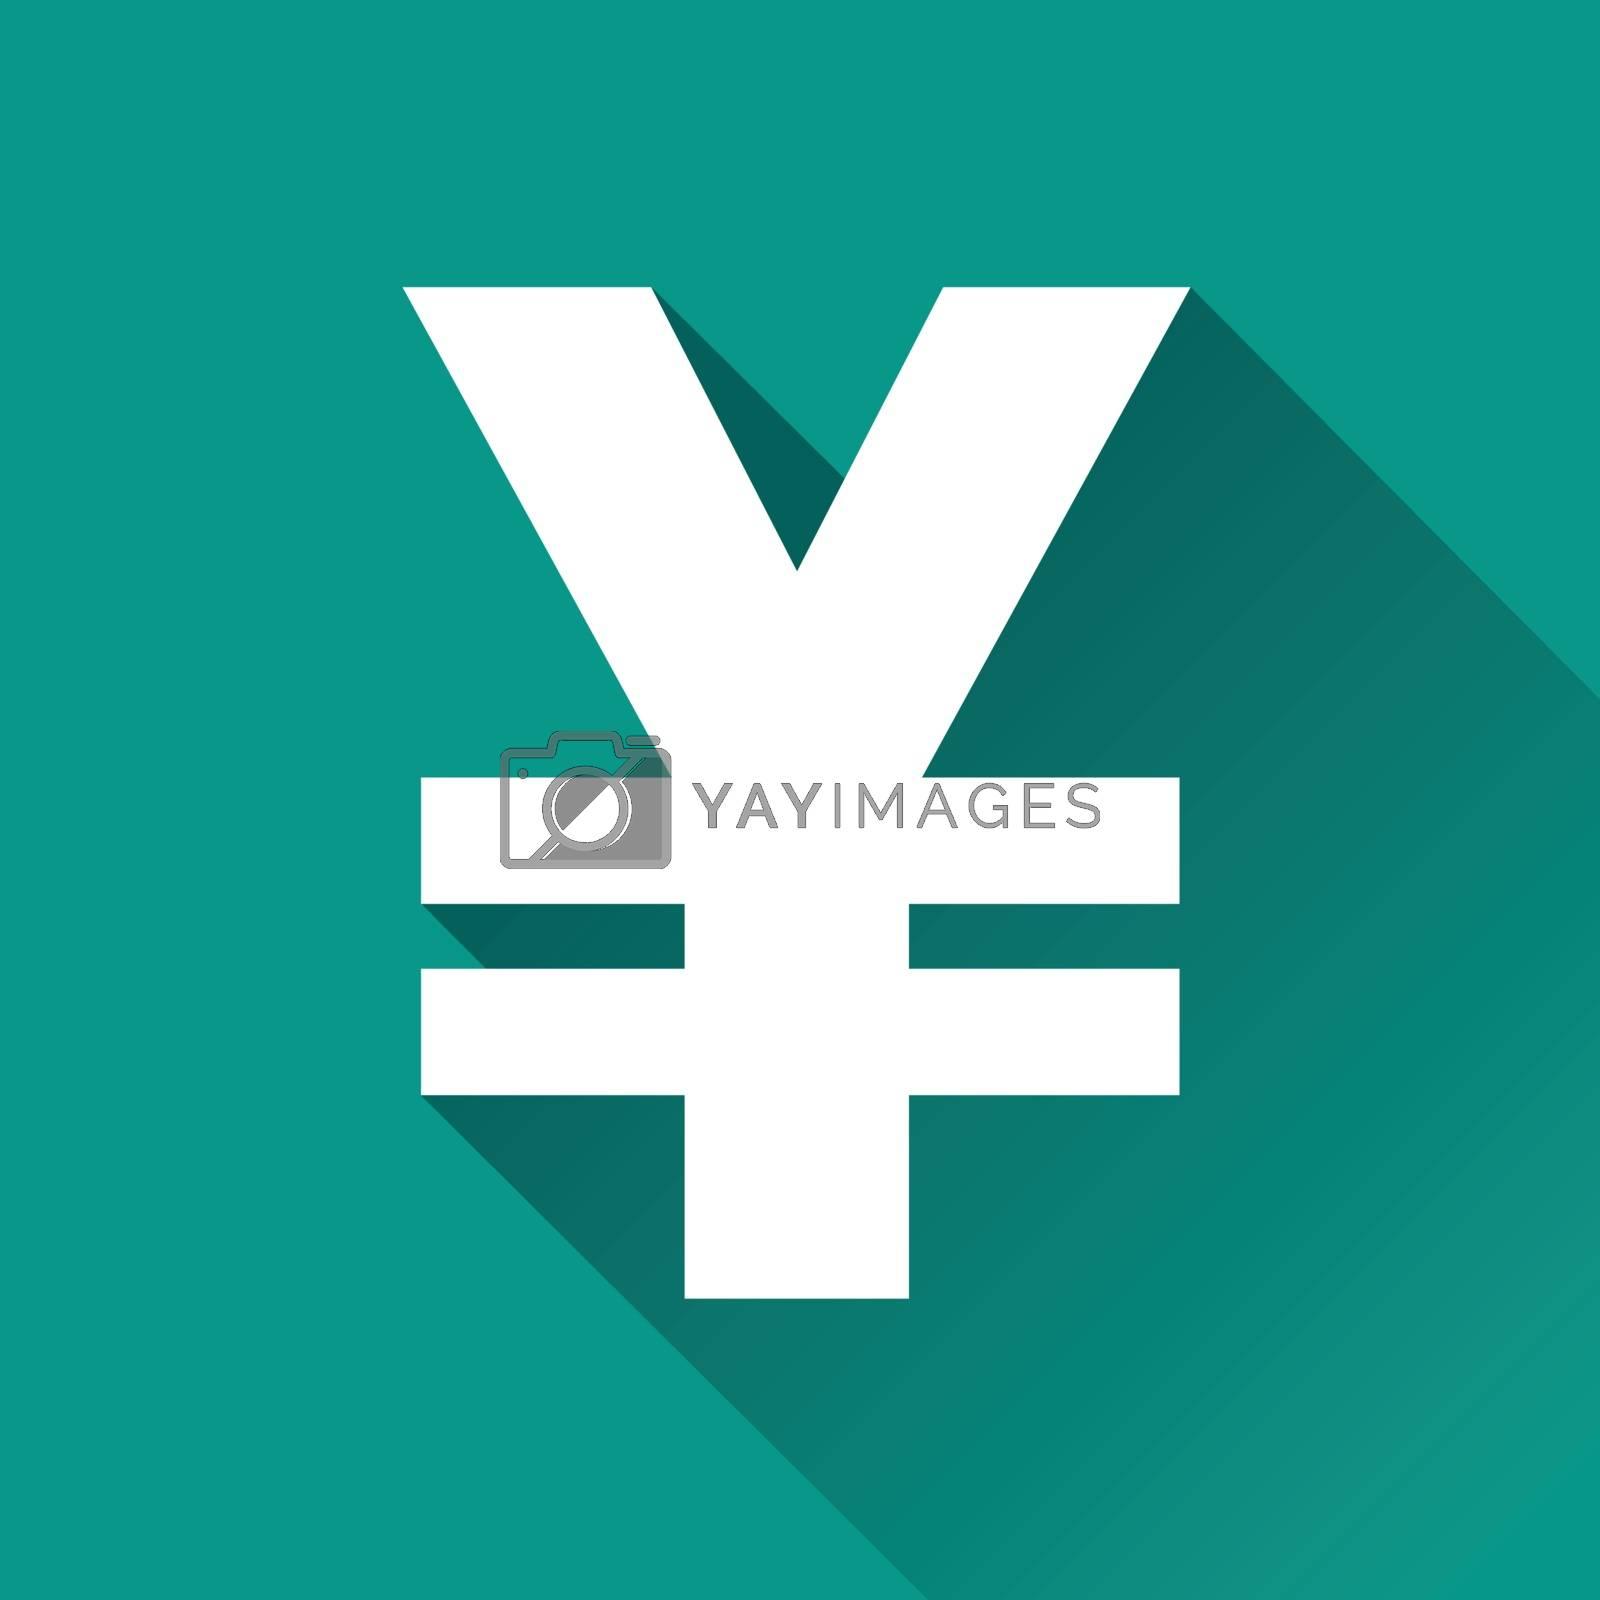 Royalty free image of yen flat design icon by nickylarson974